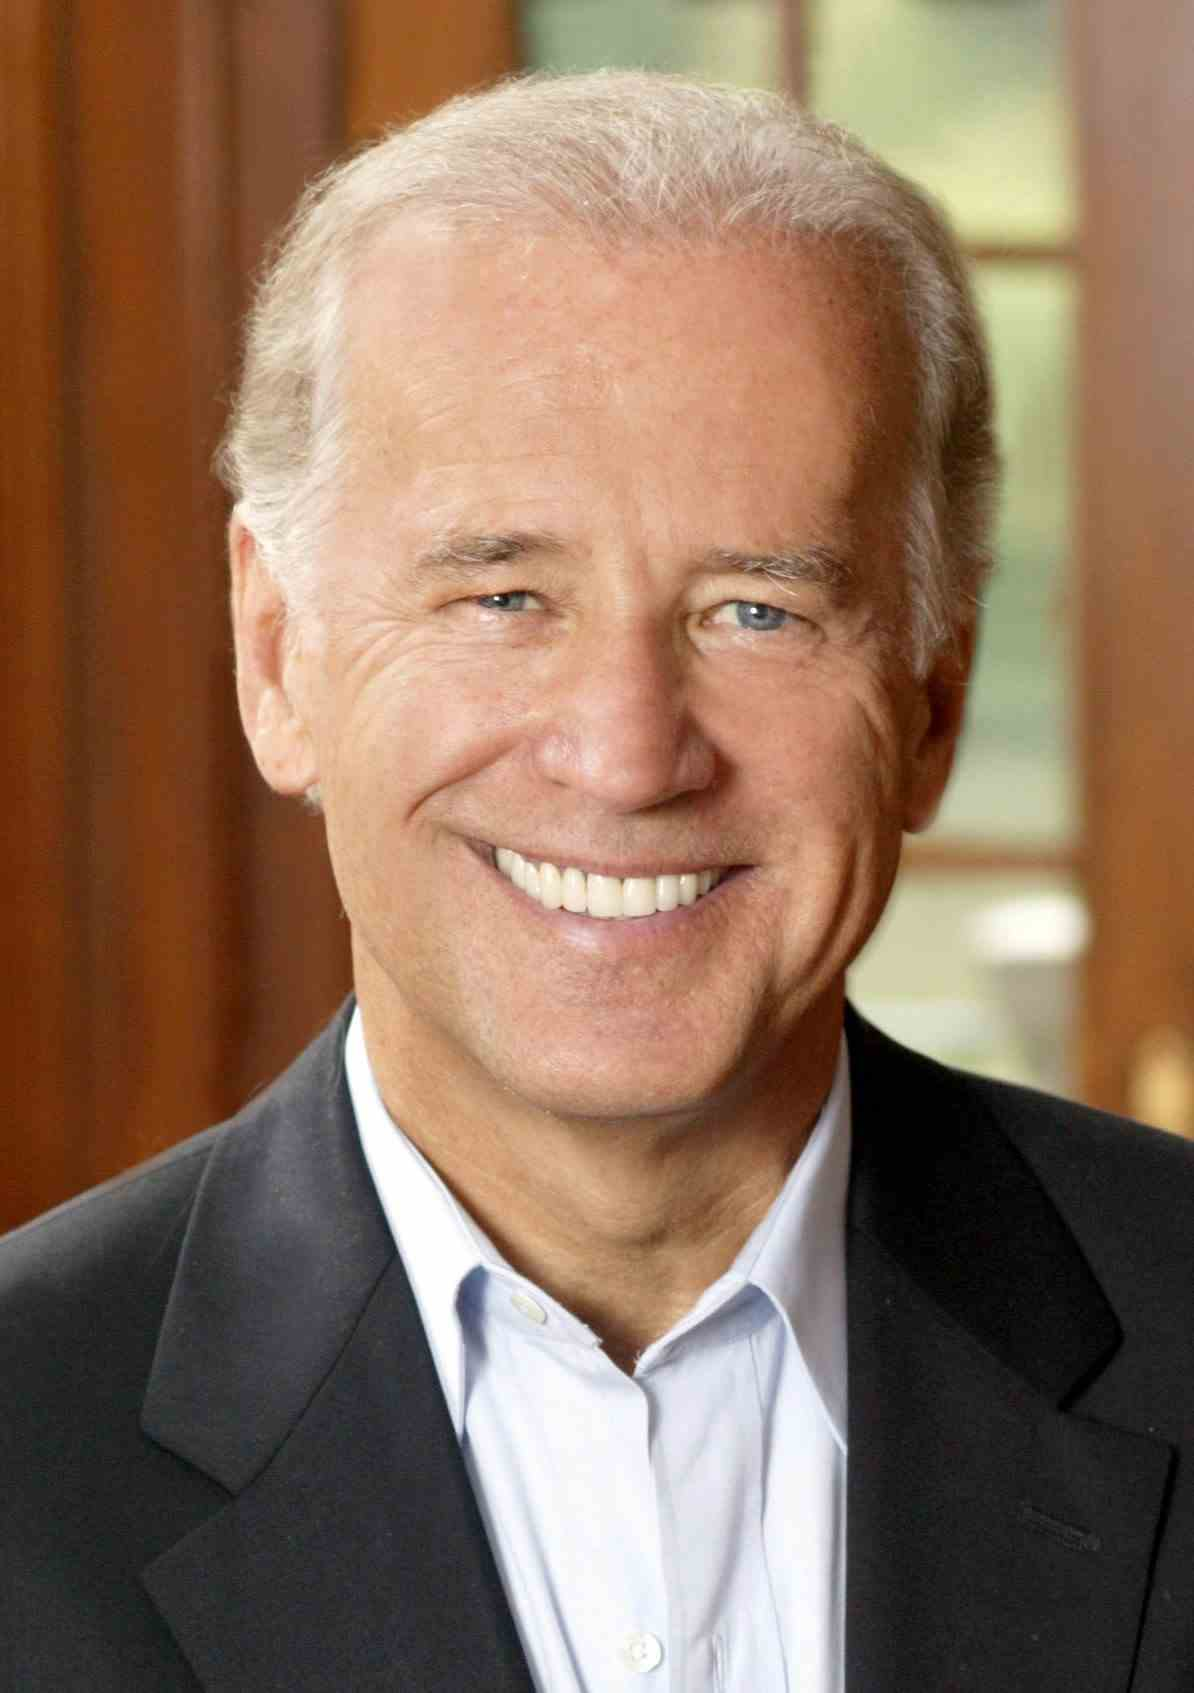 2015-03-30 Joe_Biden,_official_photo_portrait_2-cropped